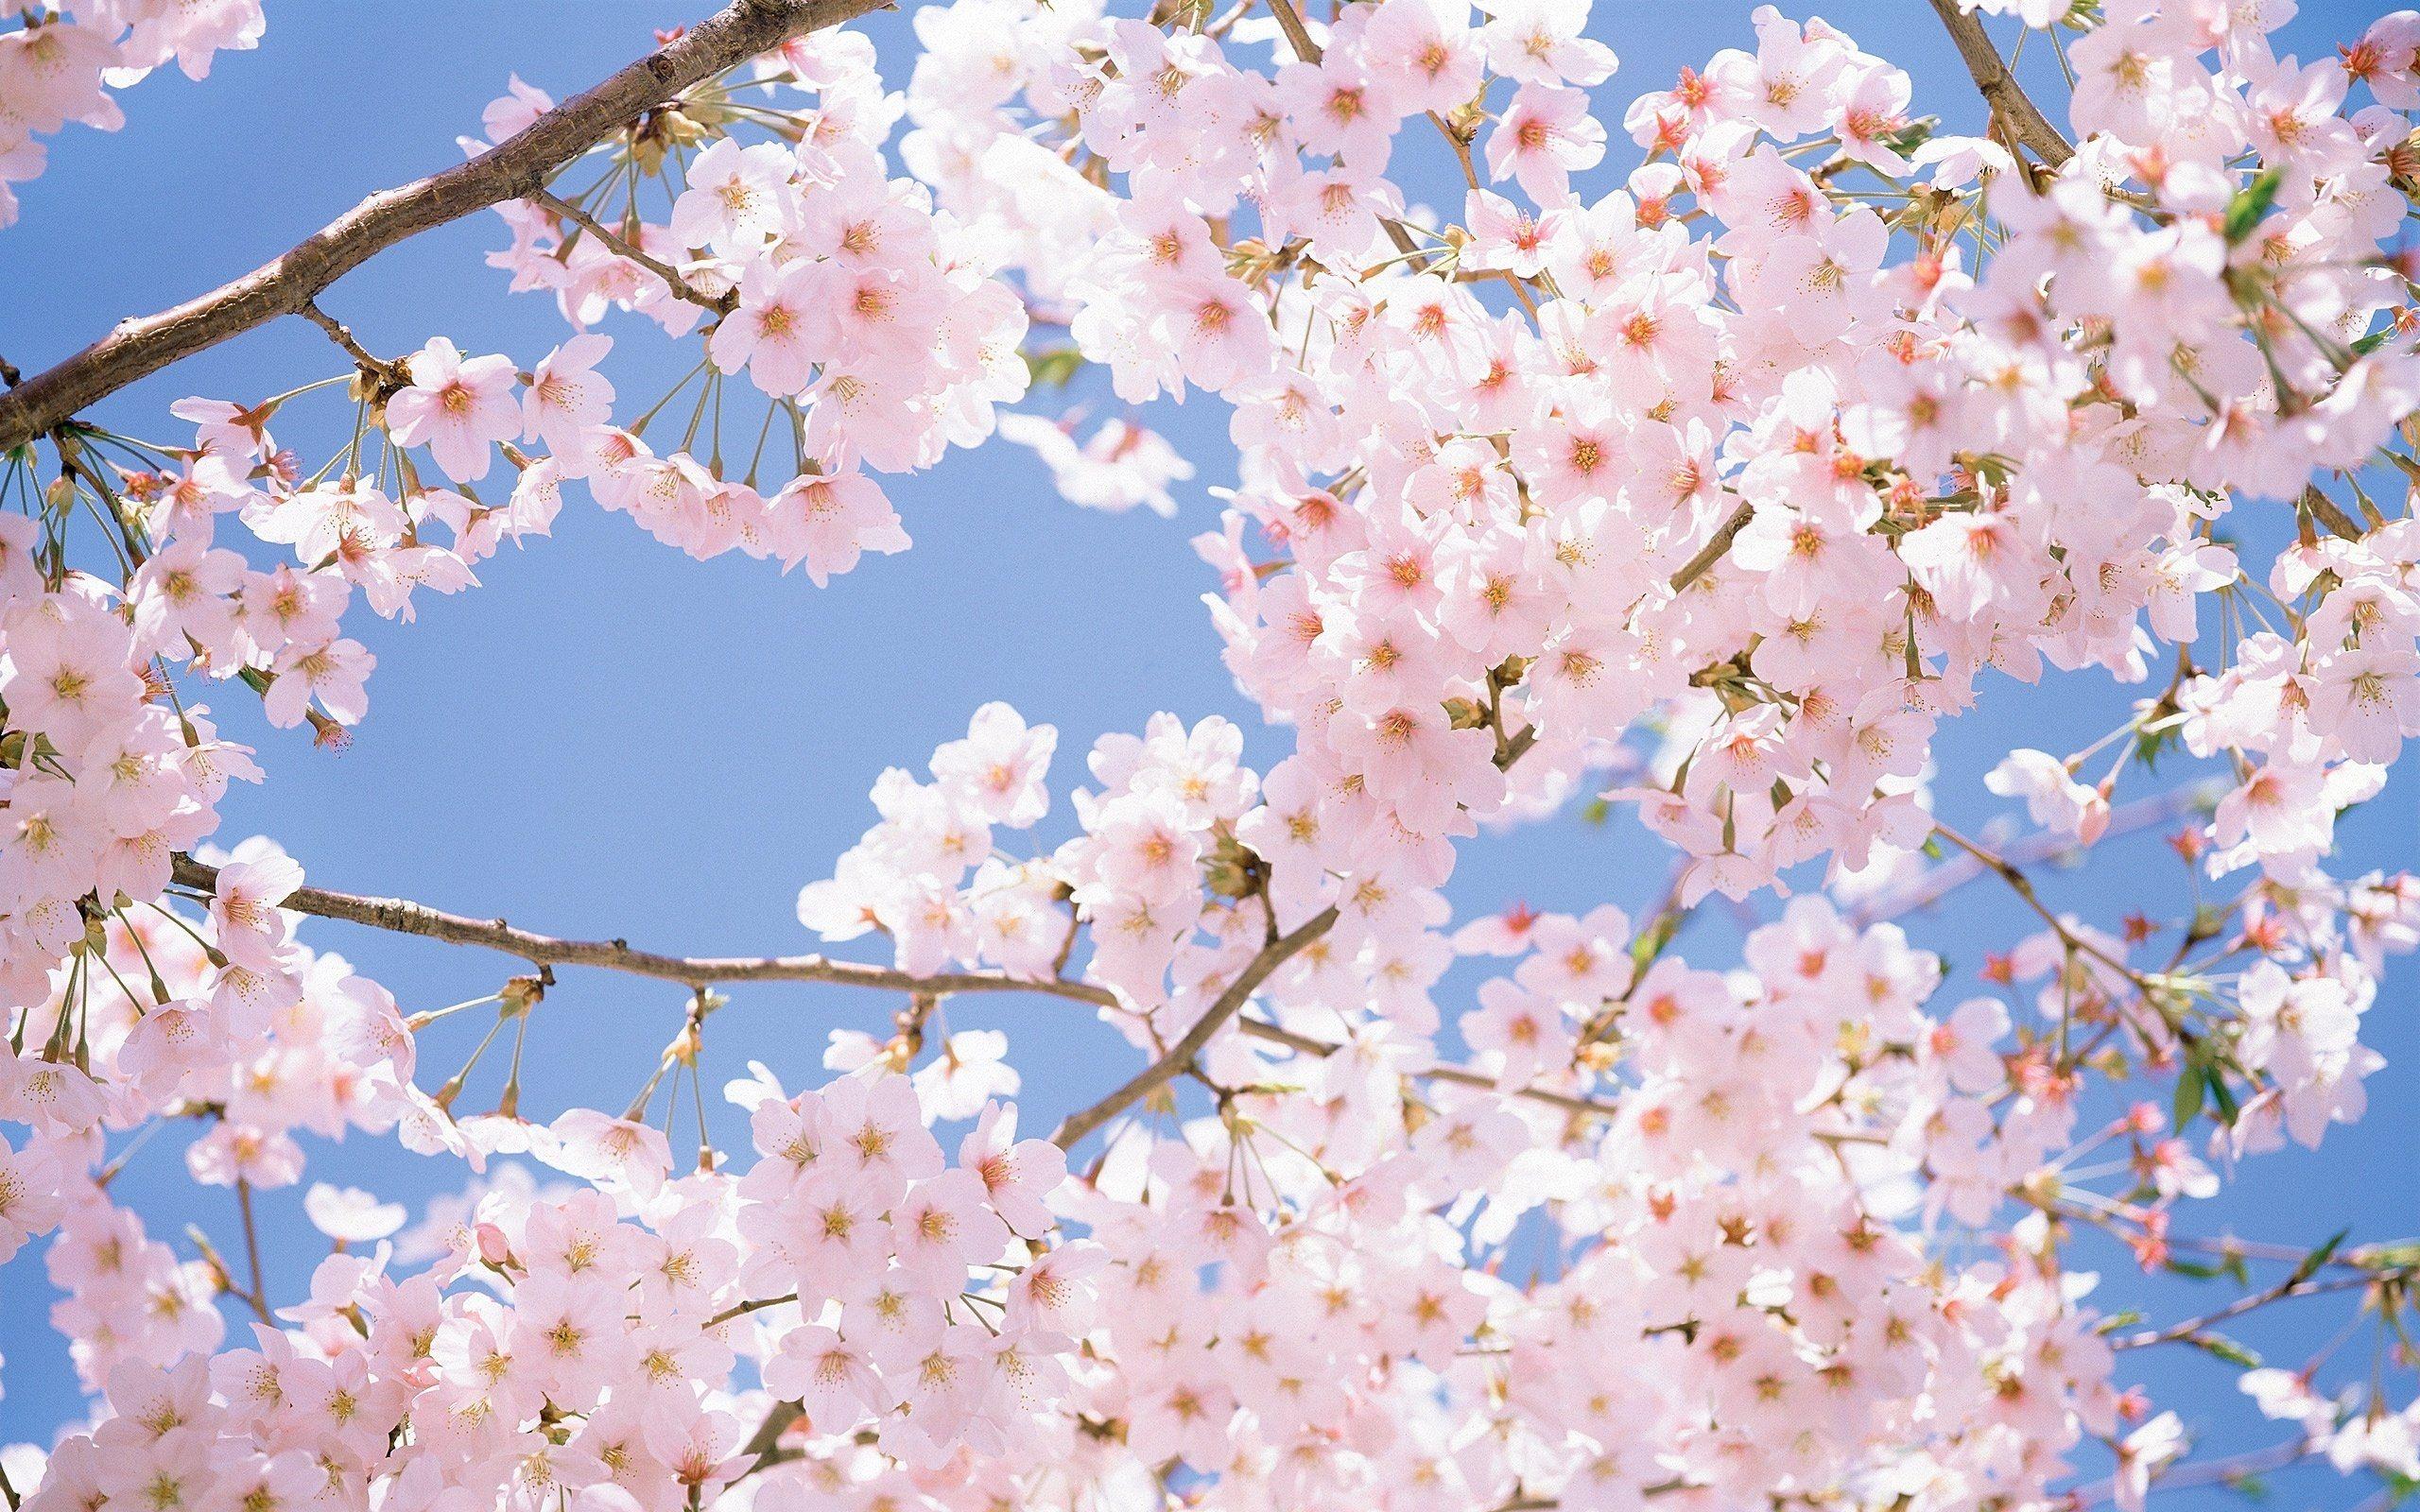 Cherry Blossom Clipart Unique Tree 5 2560 X 1600 Free Clip Art Stock Illustration Memegene N Cherry Blossom Wallpaper Flower Wallpaper Apple Blossom Flower